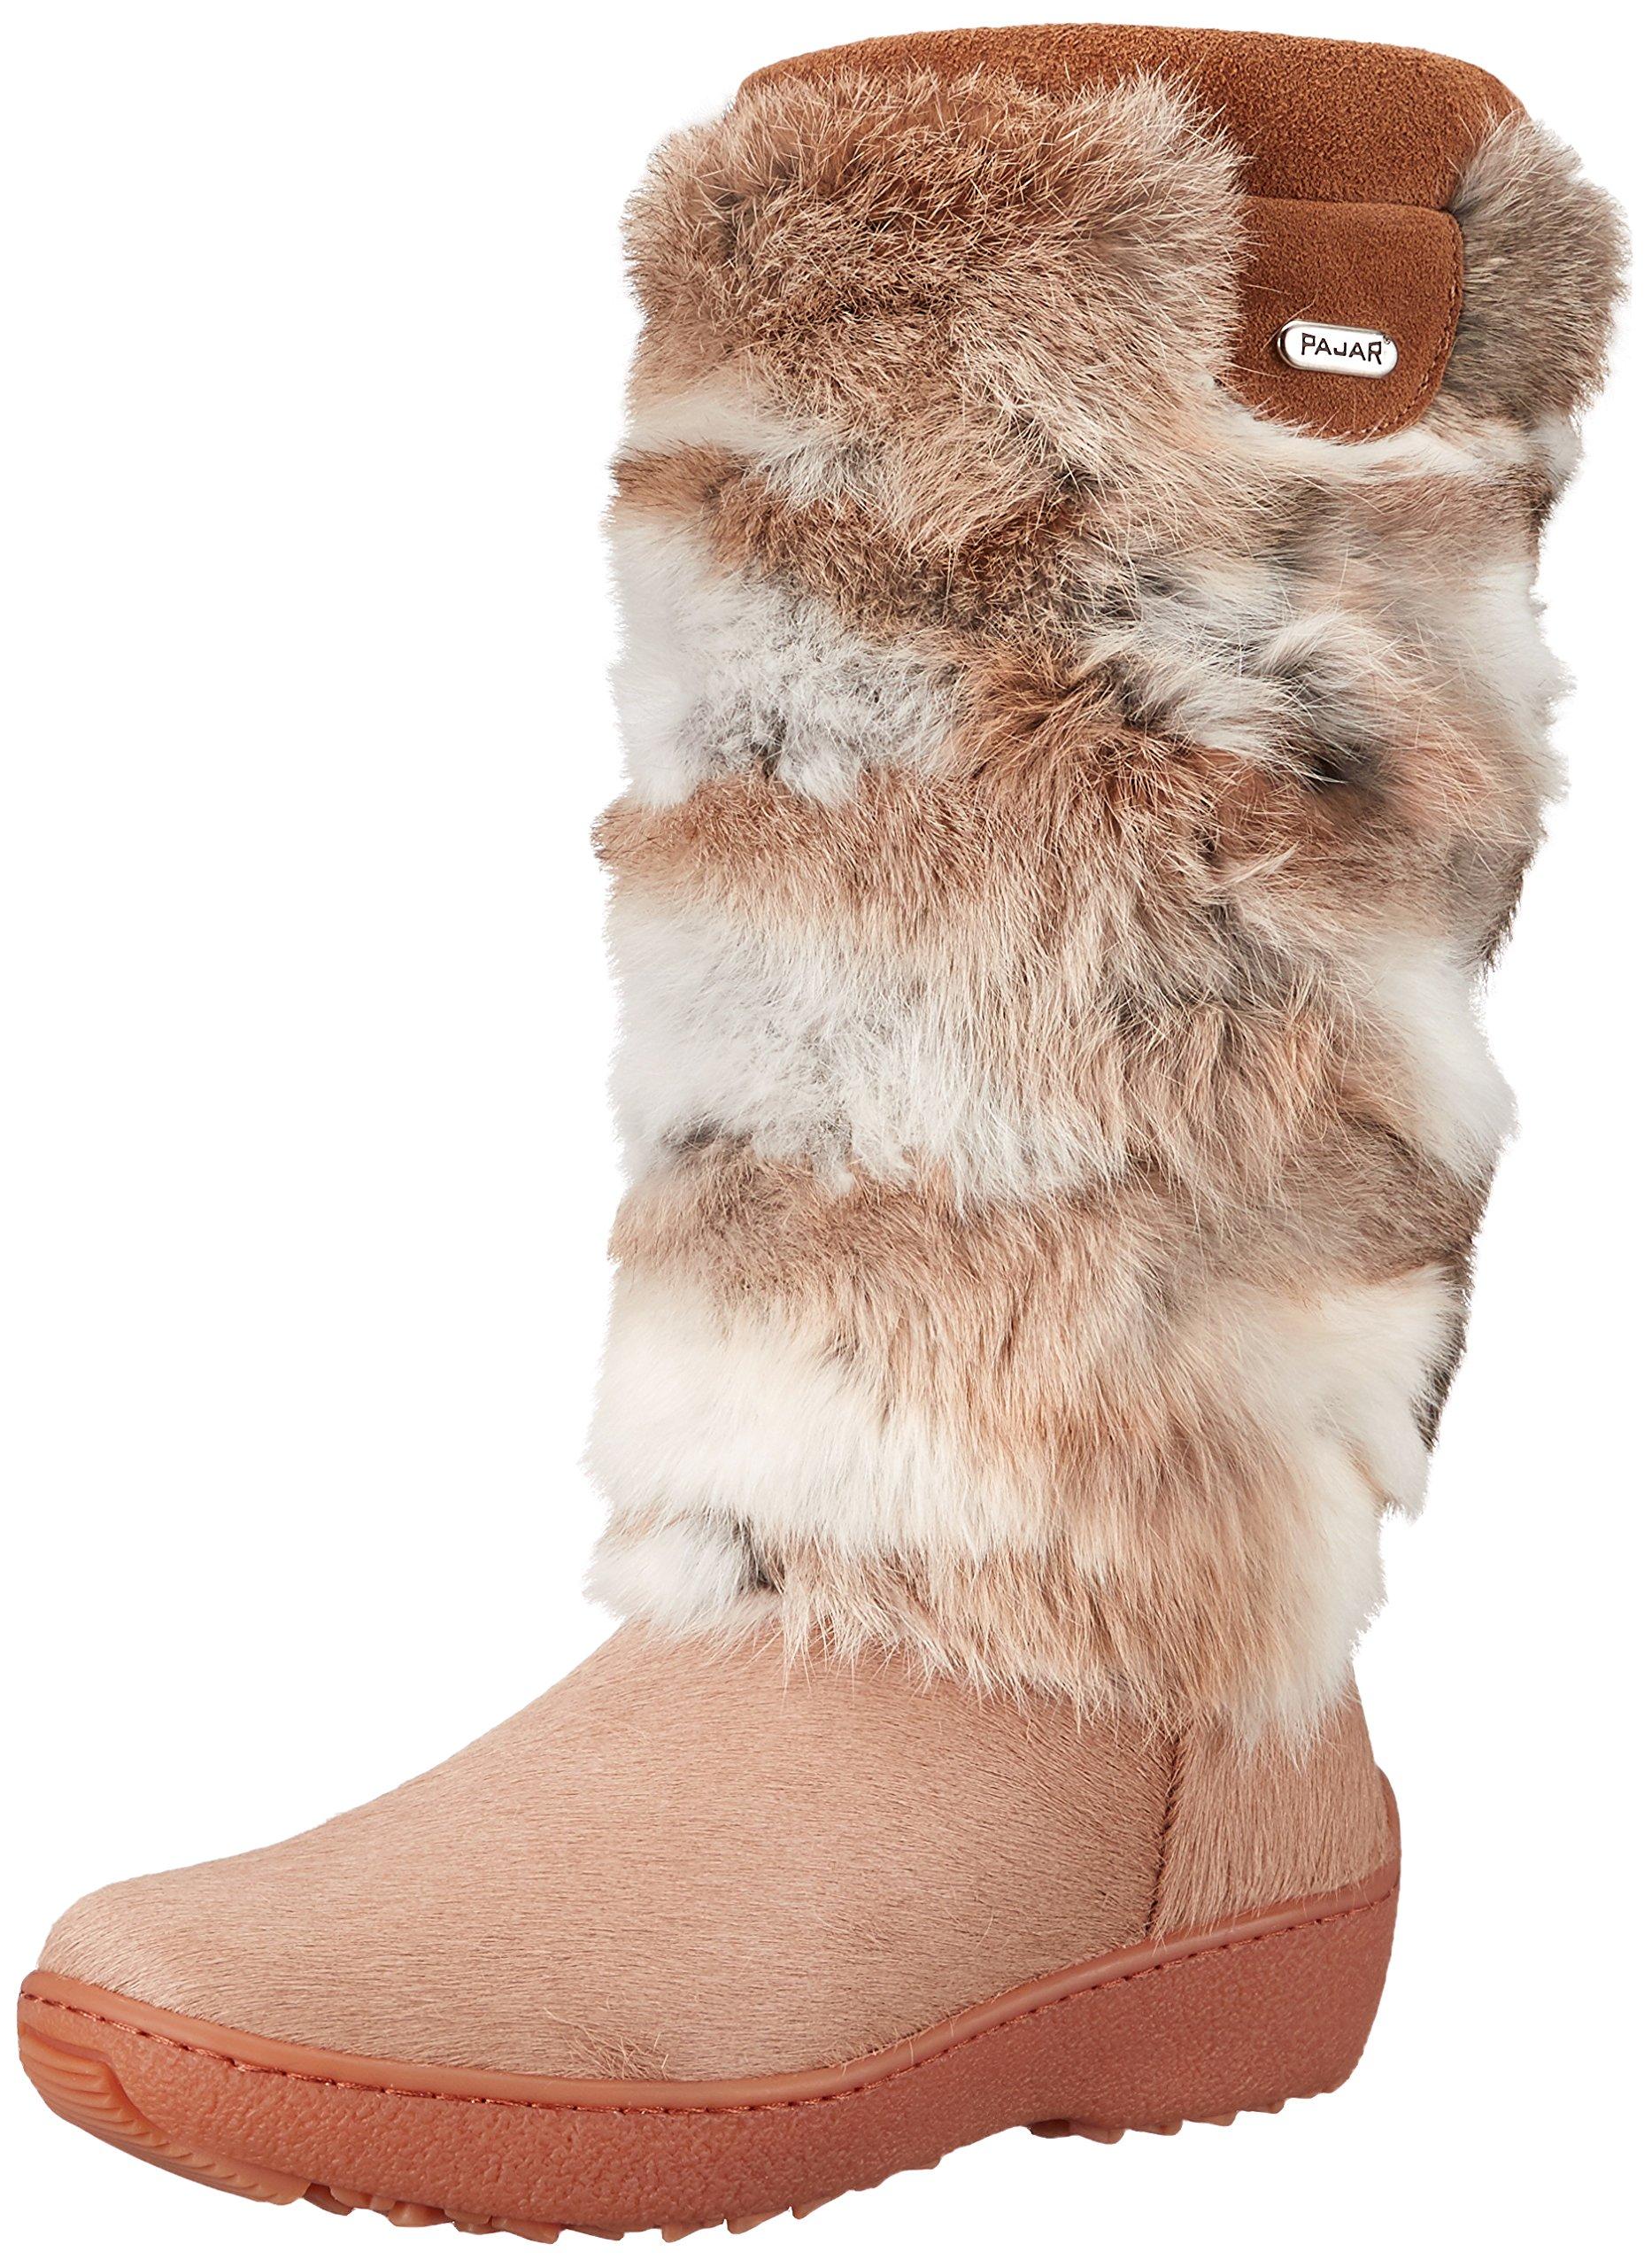 Pajar Women's Foxy Boot, Beige Rabbit, 41 EU/10 M US